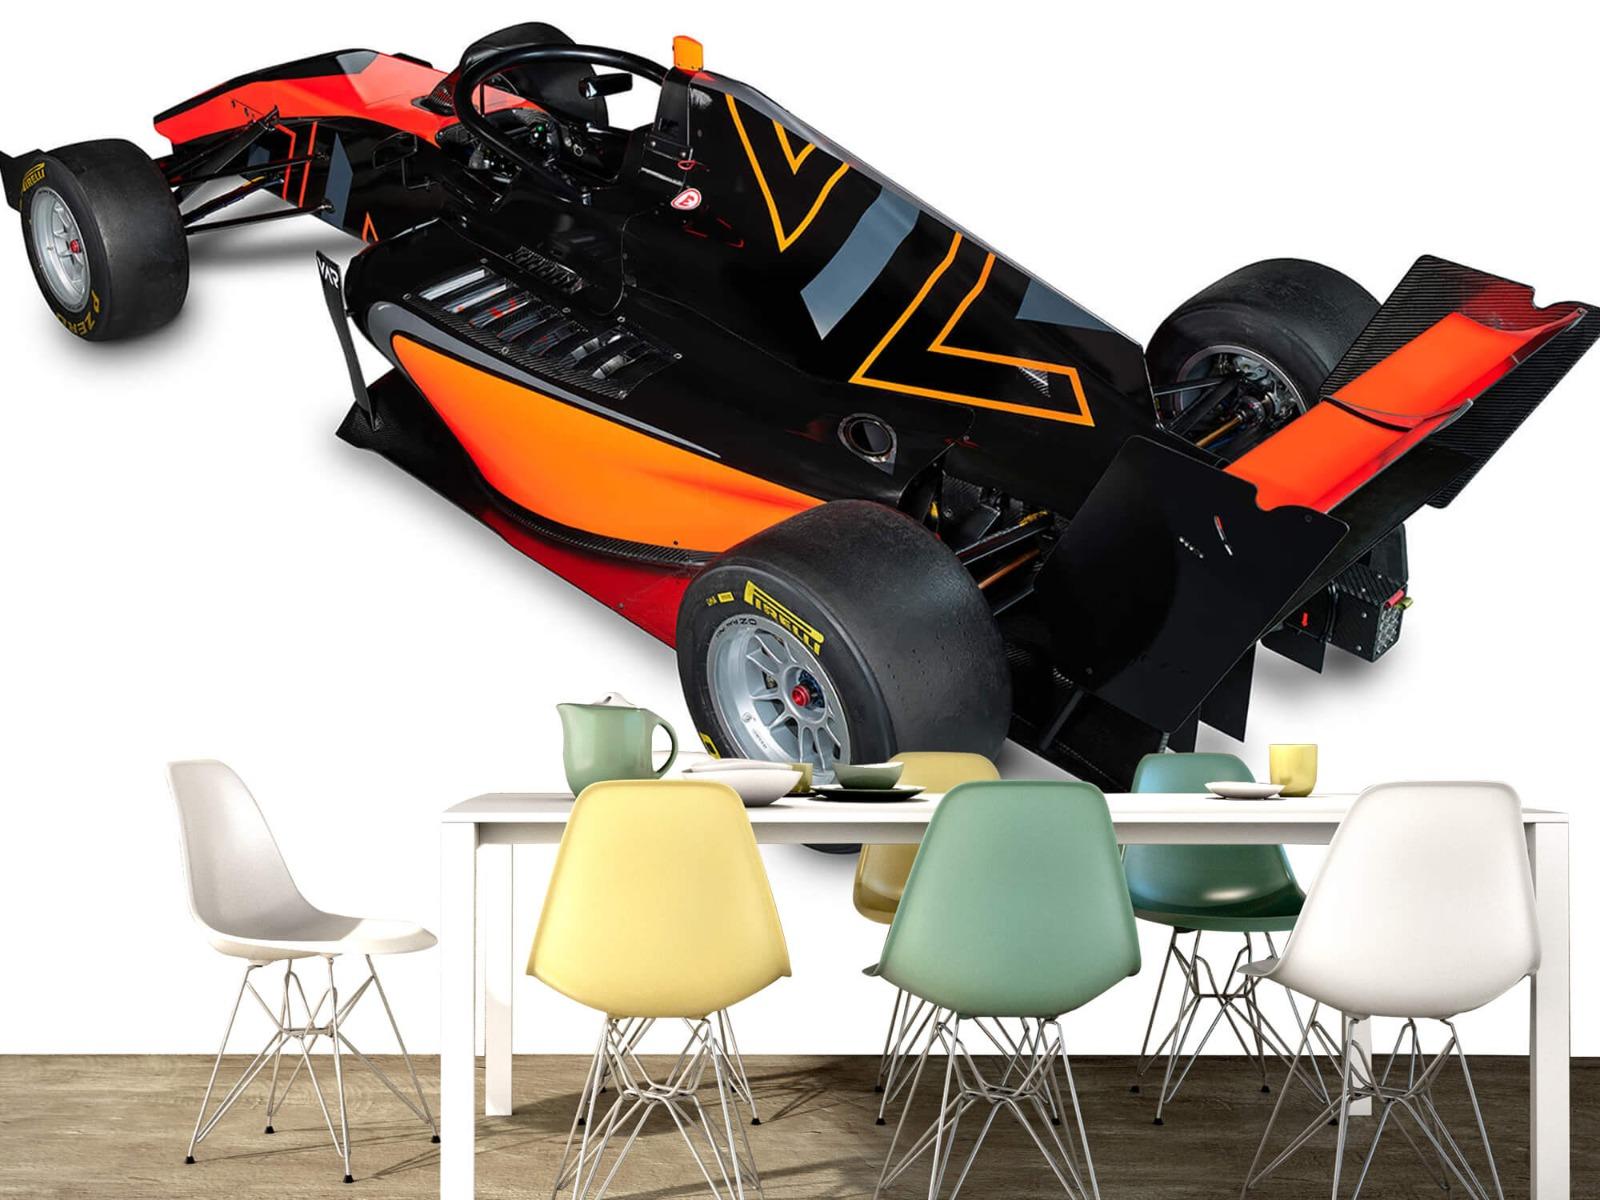 Sportauto's - Formula 3 - Rear left view - Hobbykamer 15